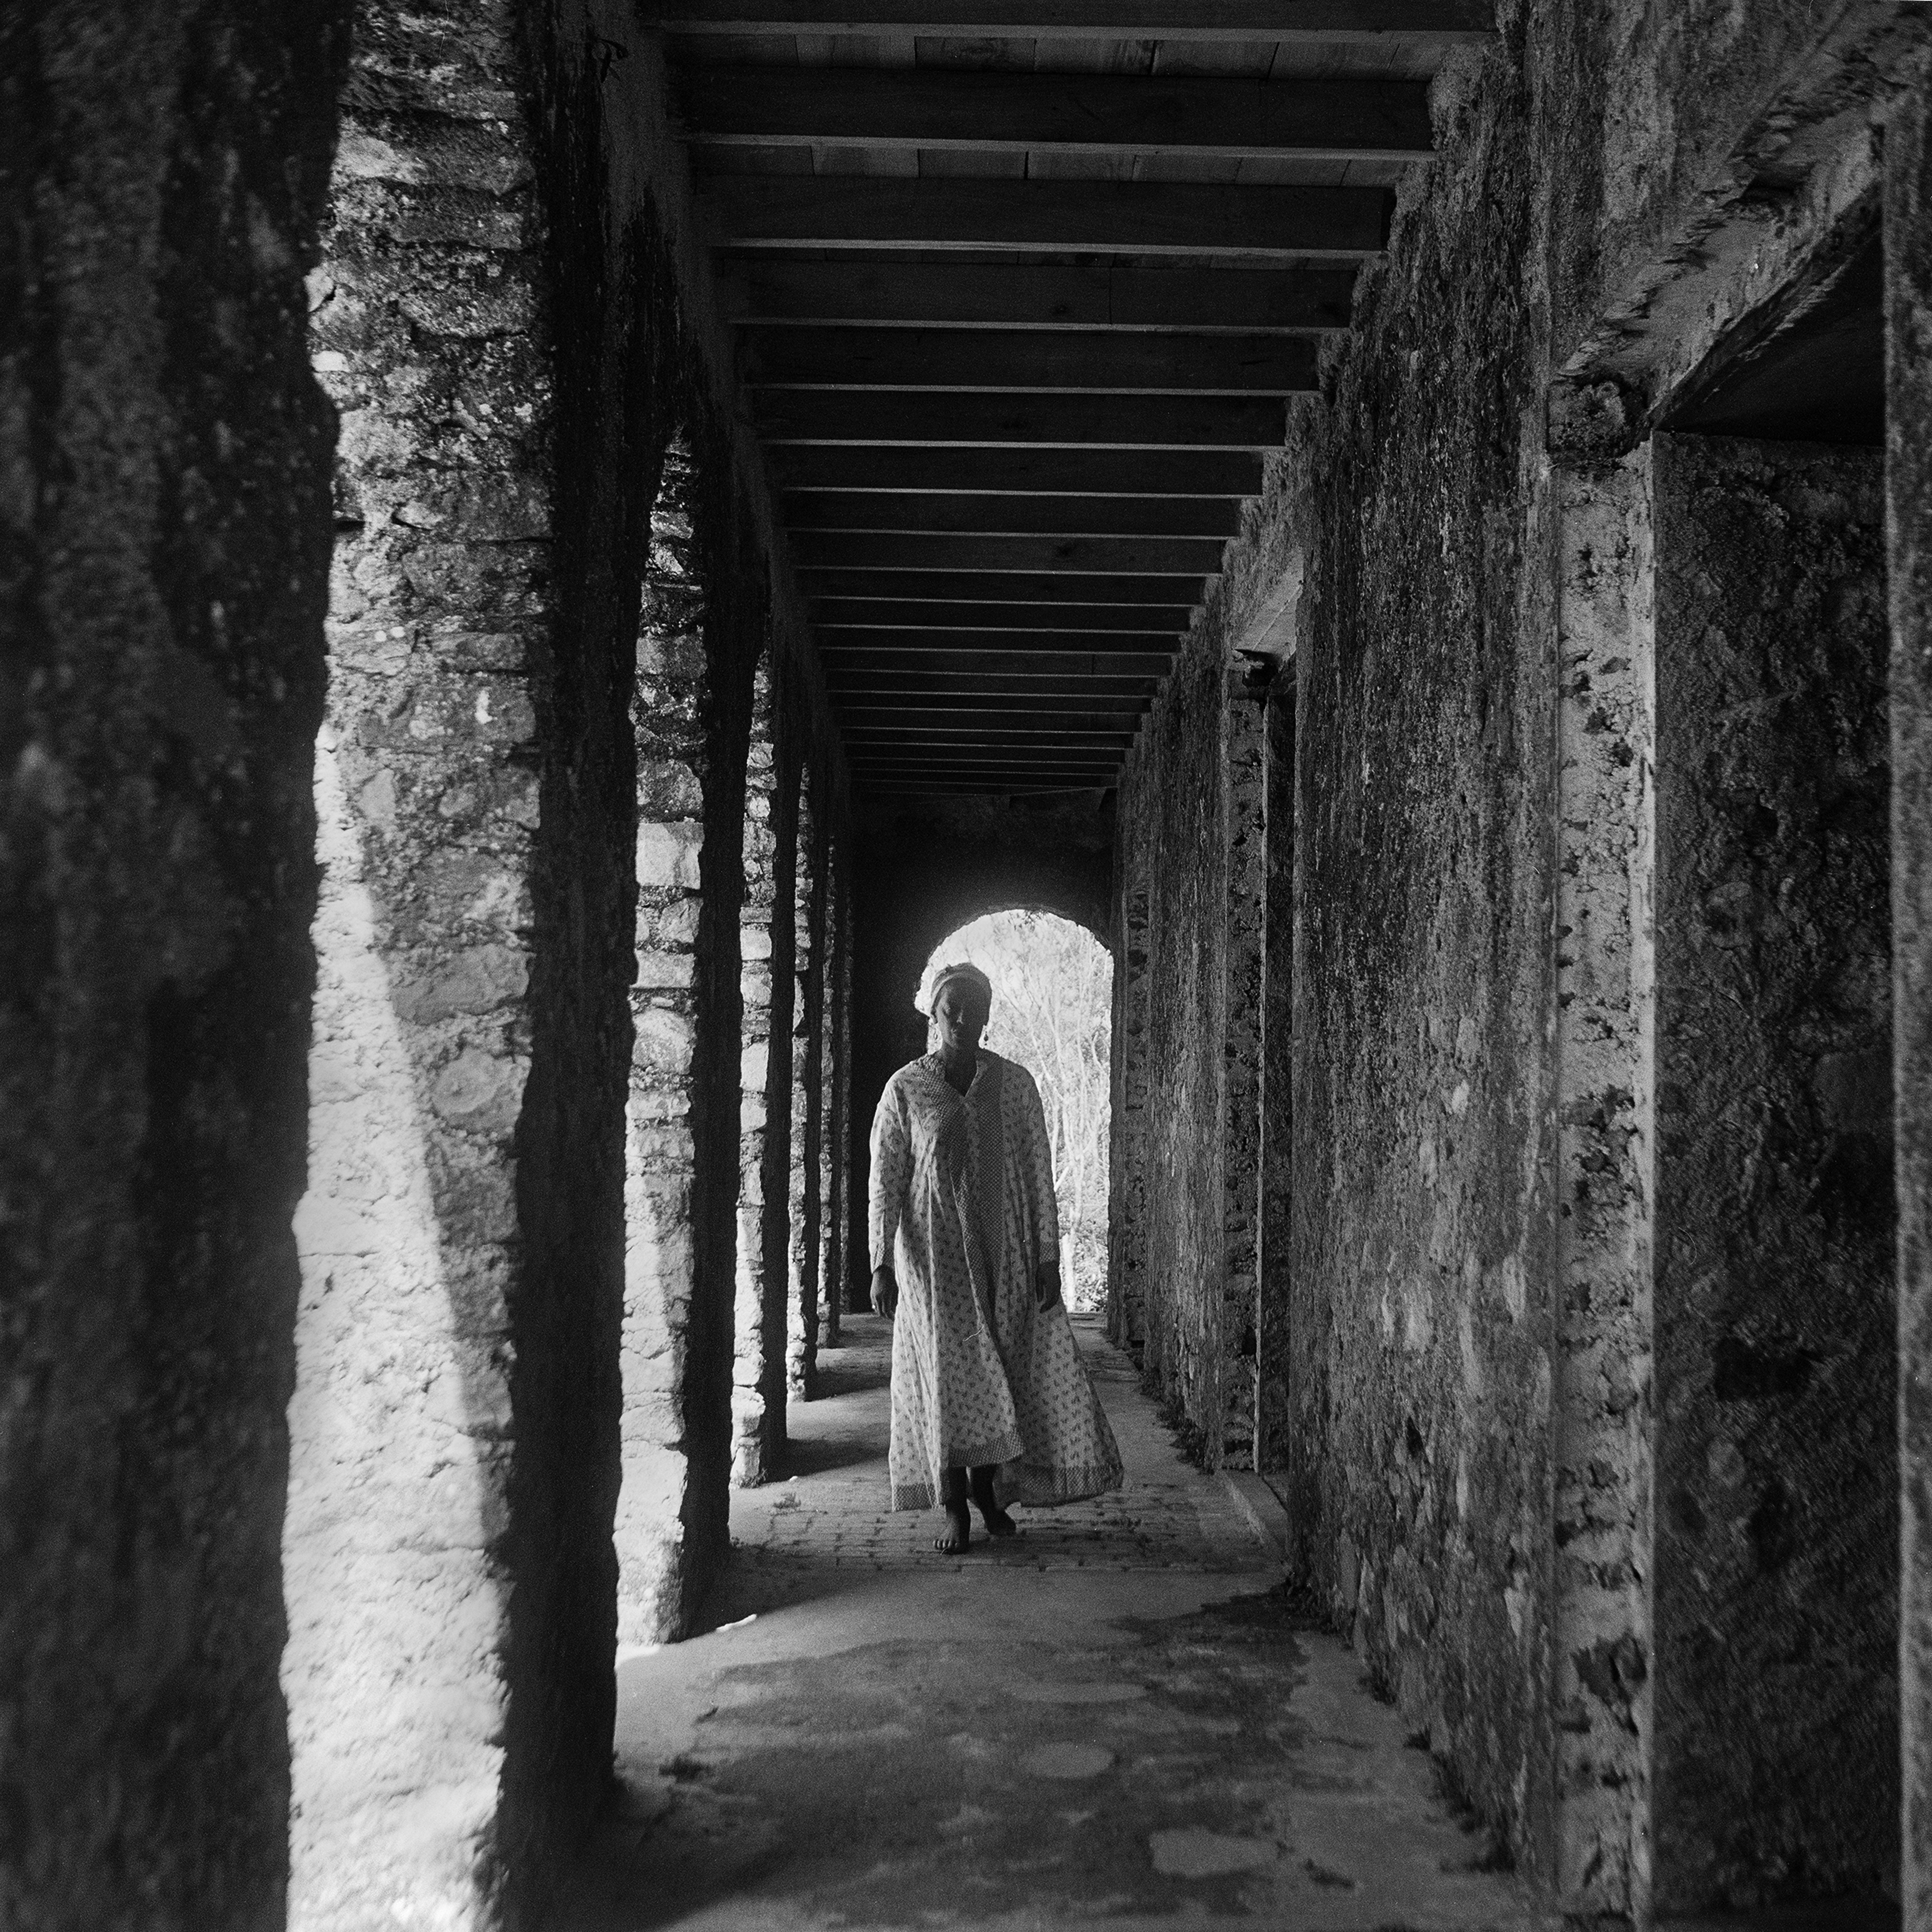 Galerie Barbara Thumm \ Carrie Mae Weems: Corridor #1 (Woman facing forward) (CMW-02-010) \ Corridor #1 (Woman facing forward) (2002)